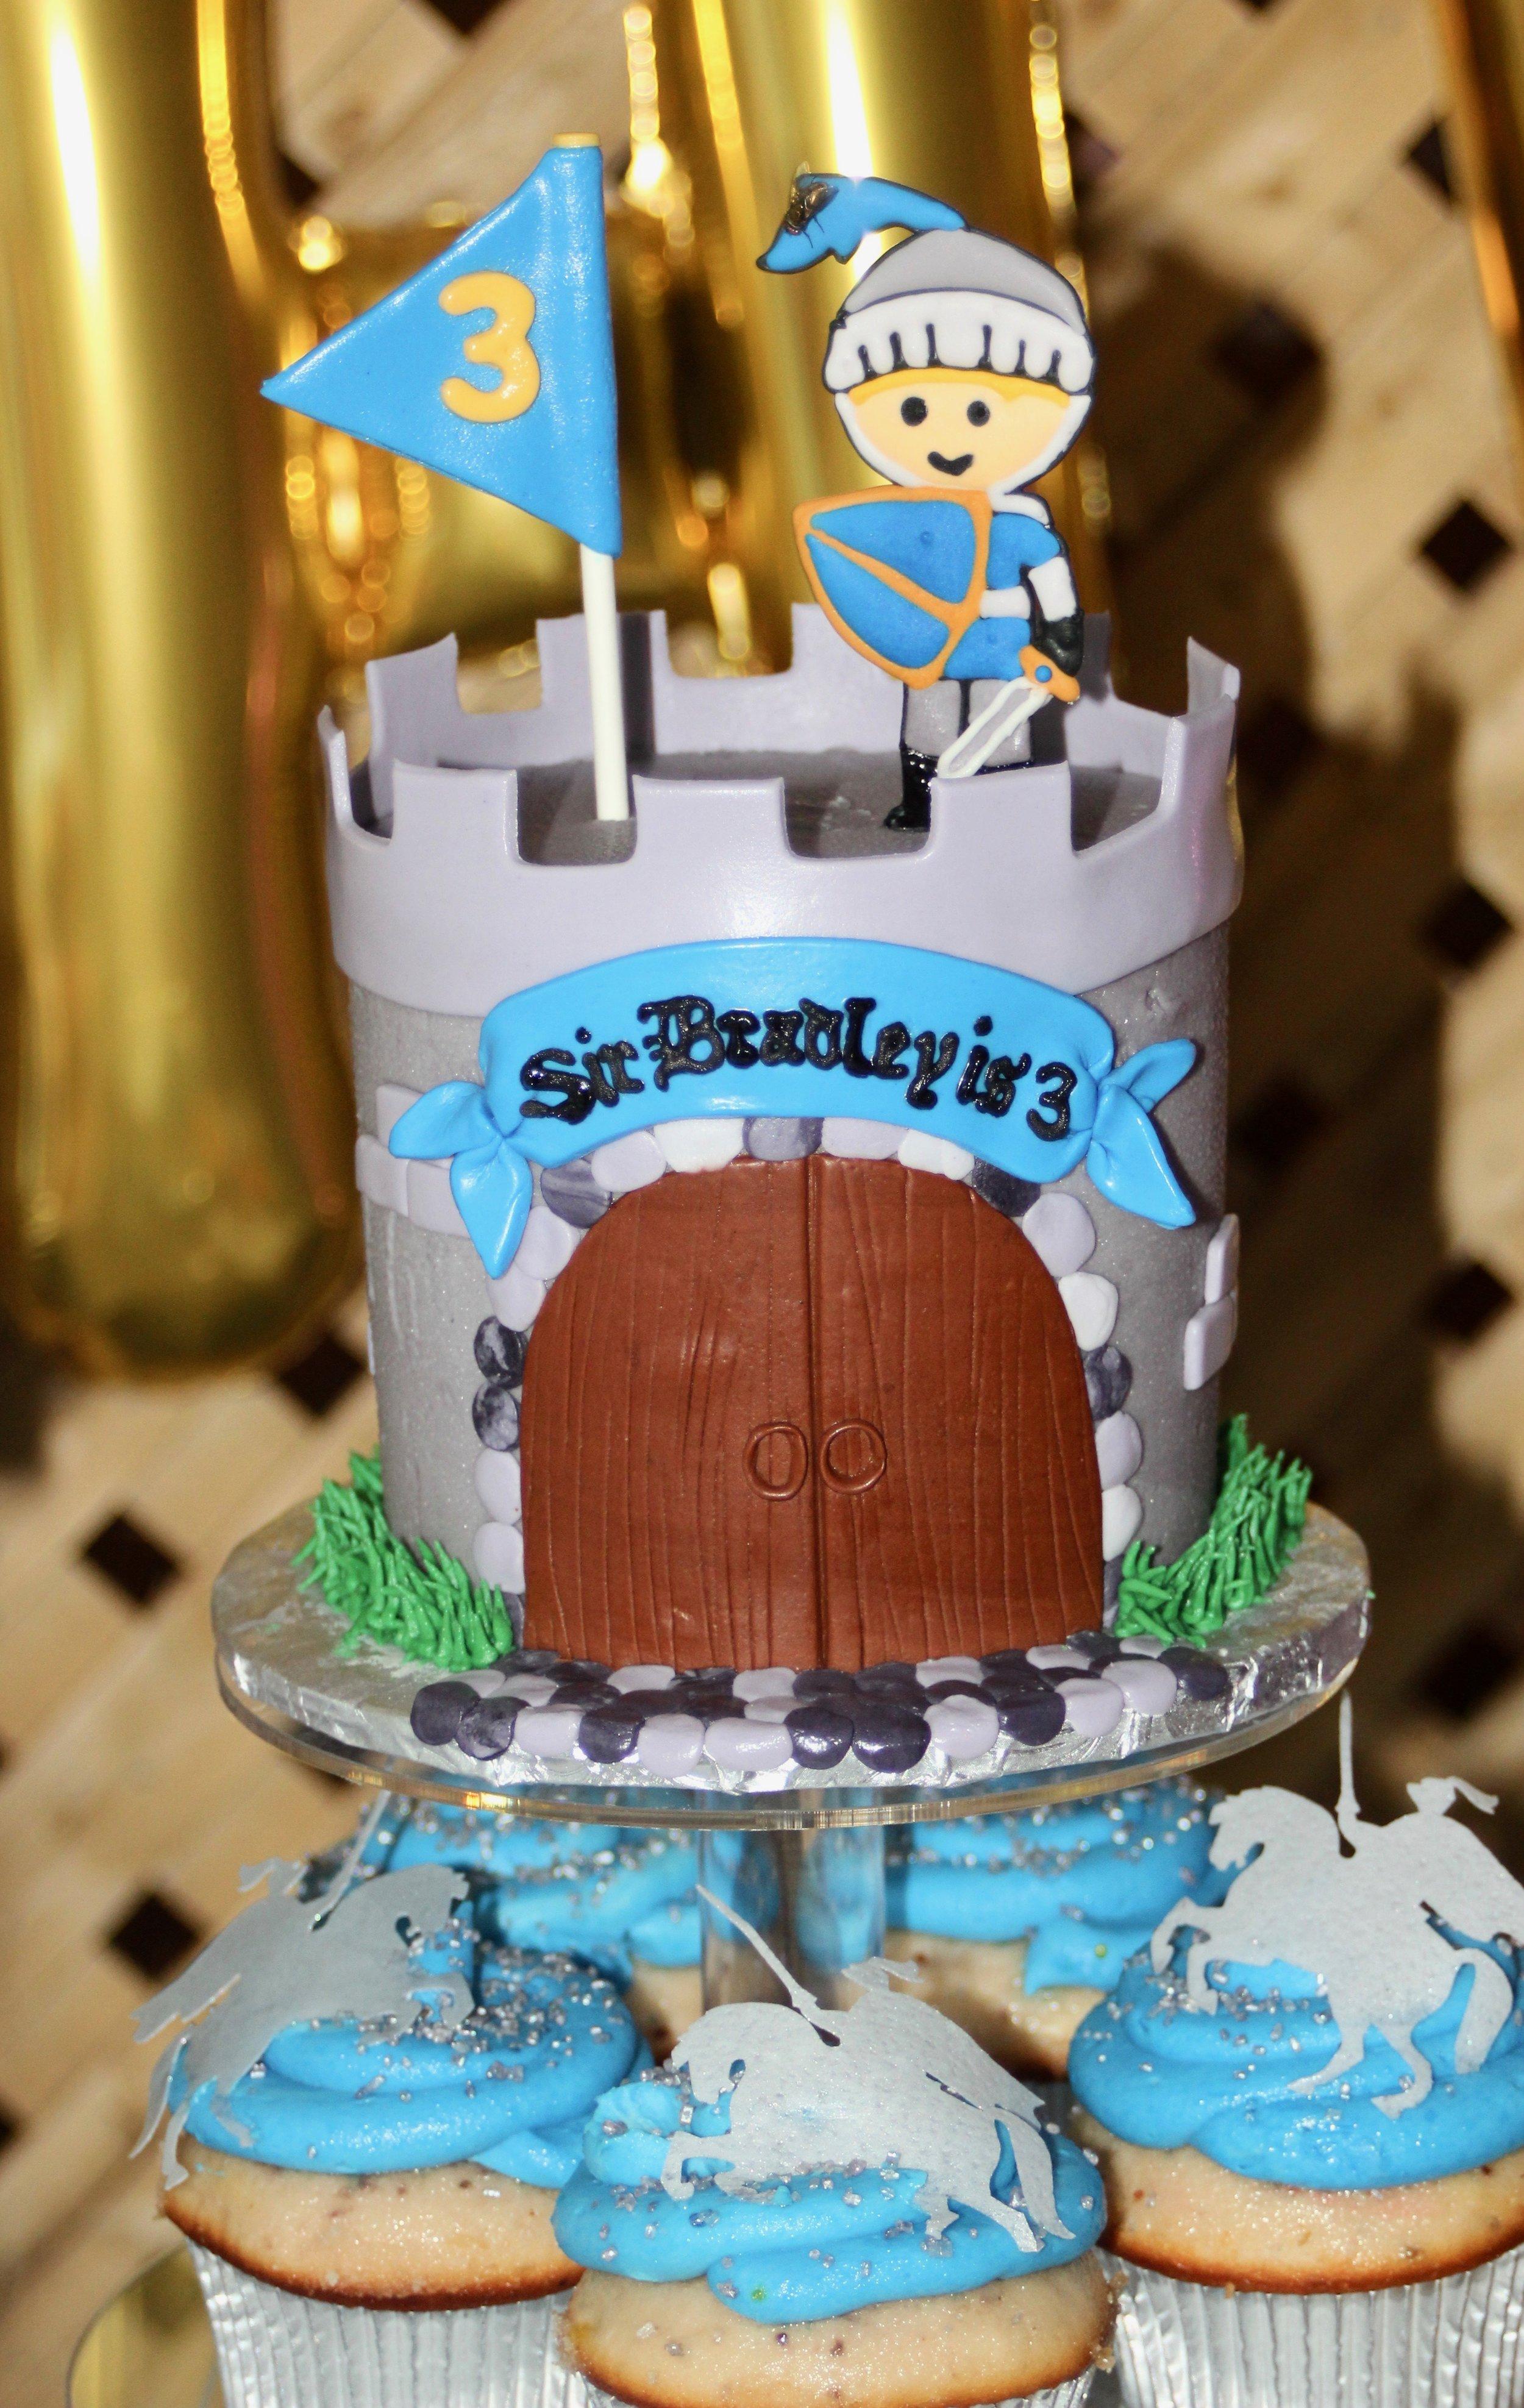 bday cake 2.jpg